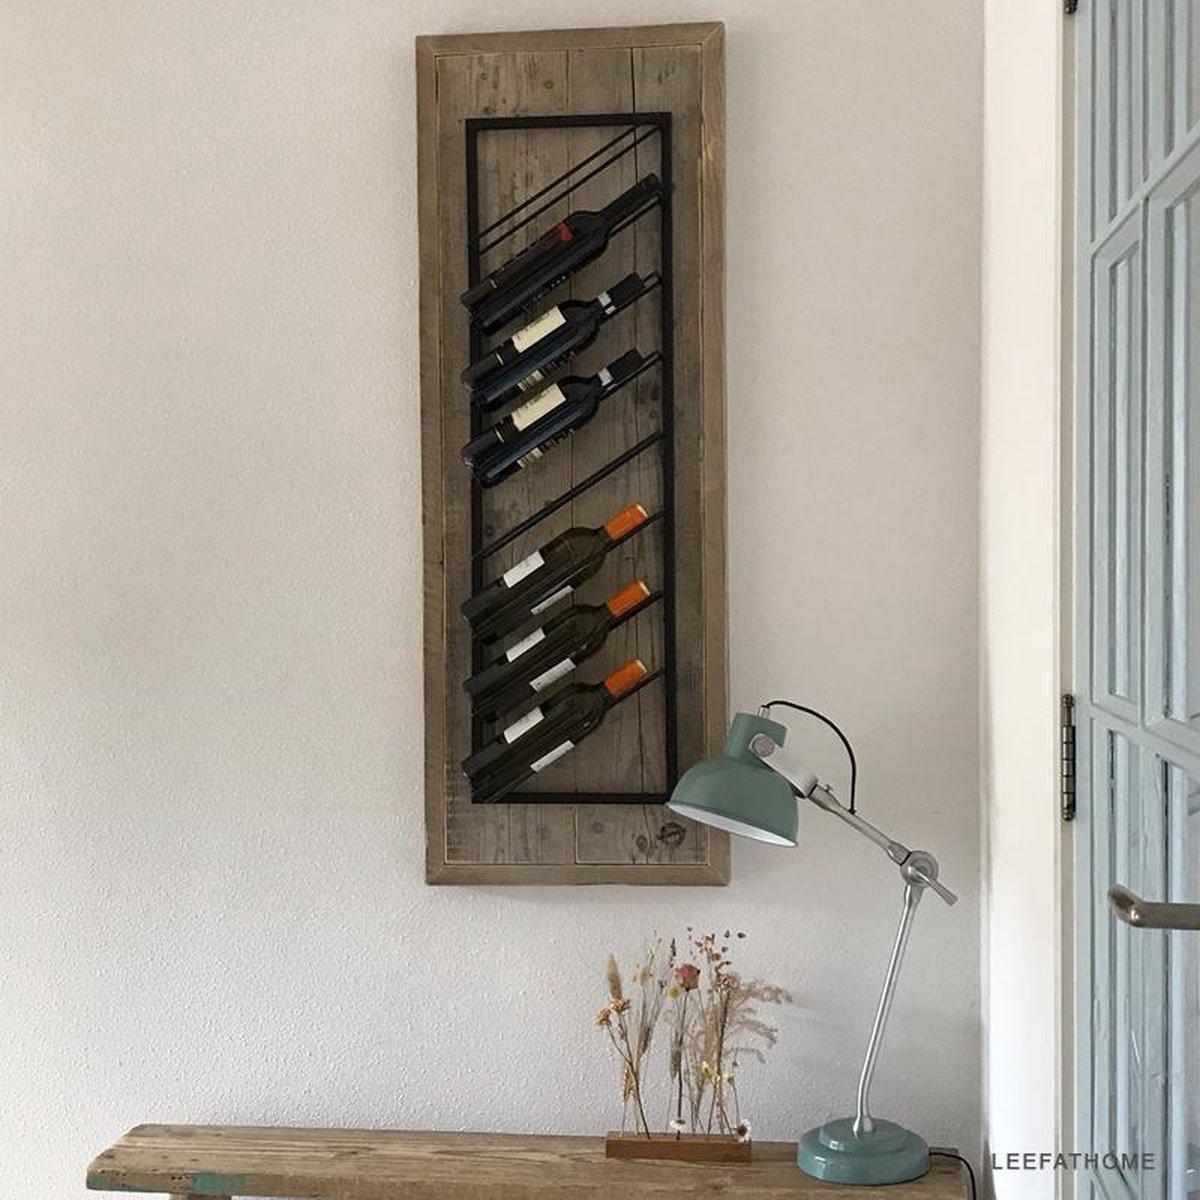 Industrieel wijnrek - 8 flessen - steigerhout - formaat 46 x 126 x 14 cm.